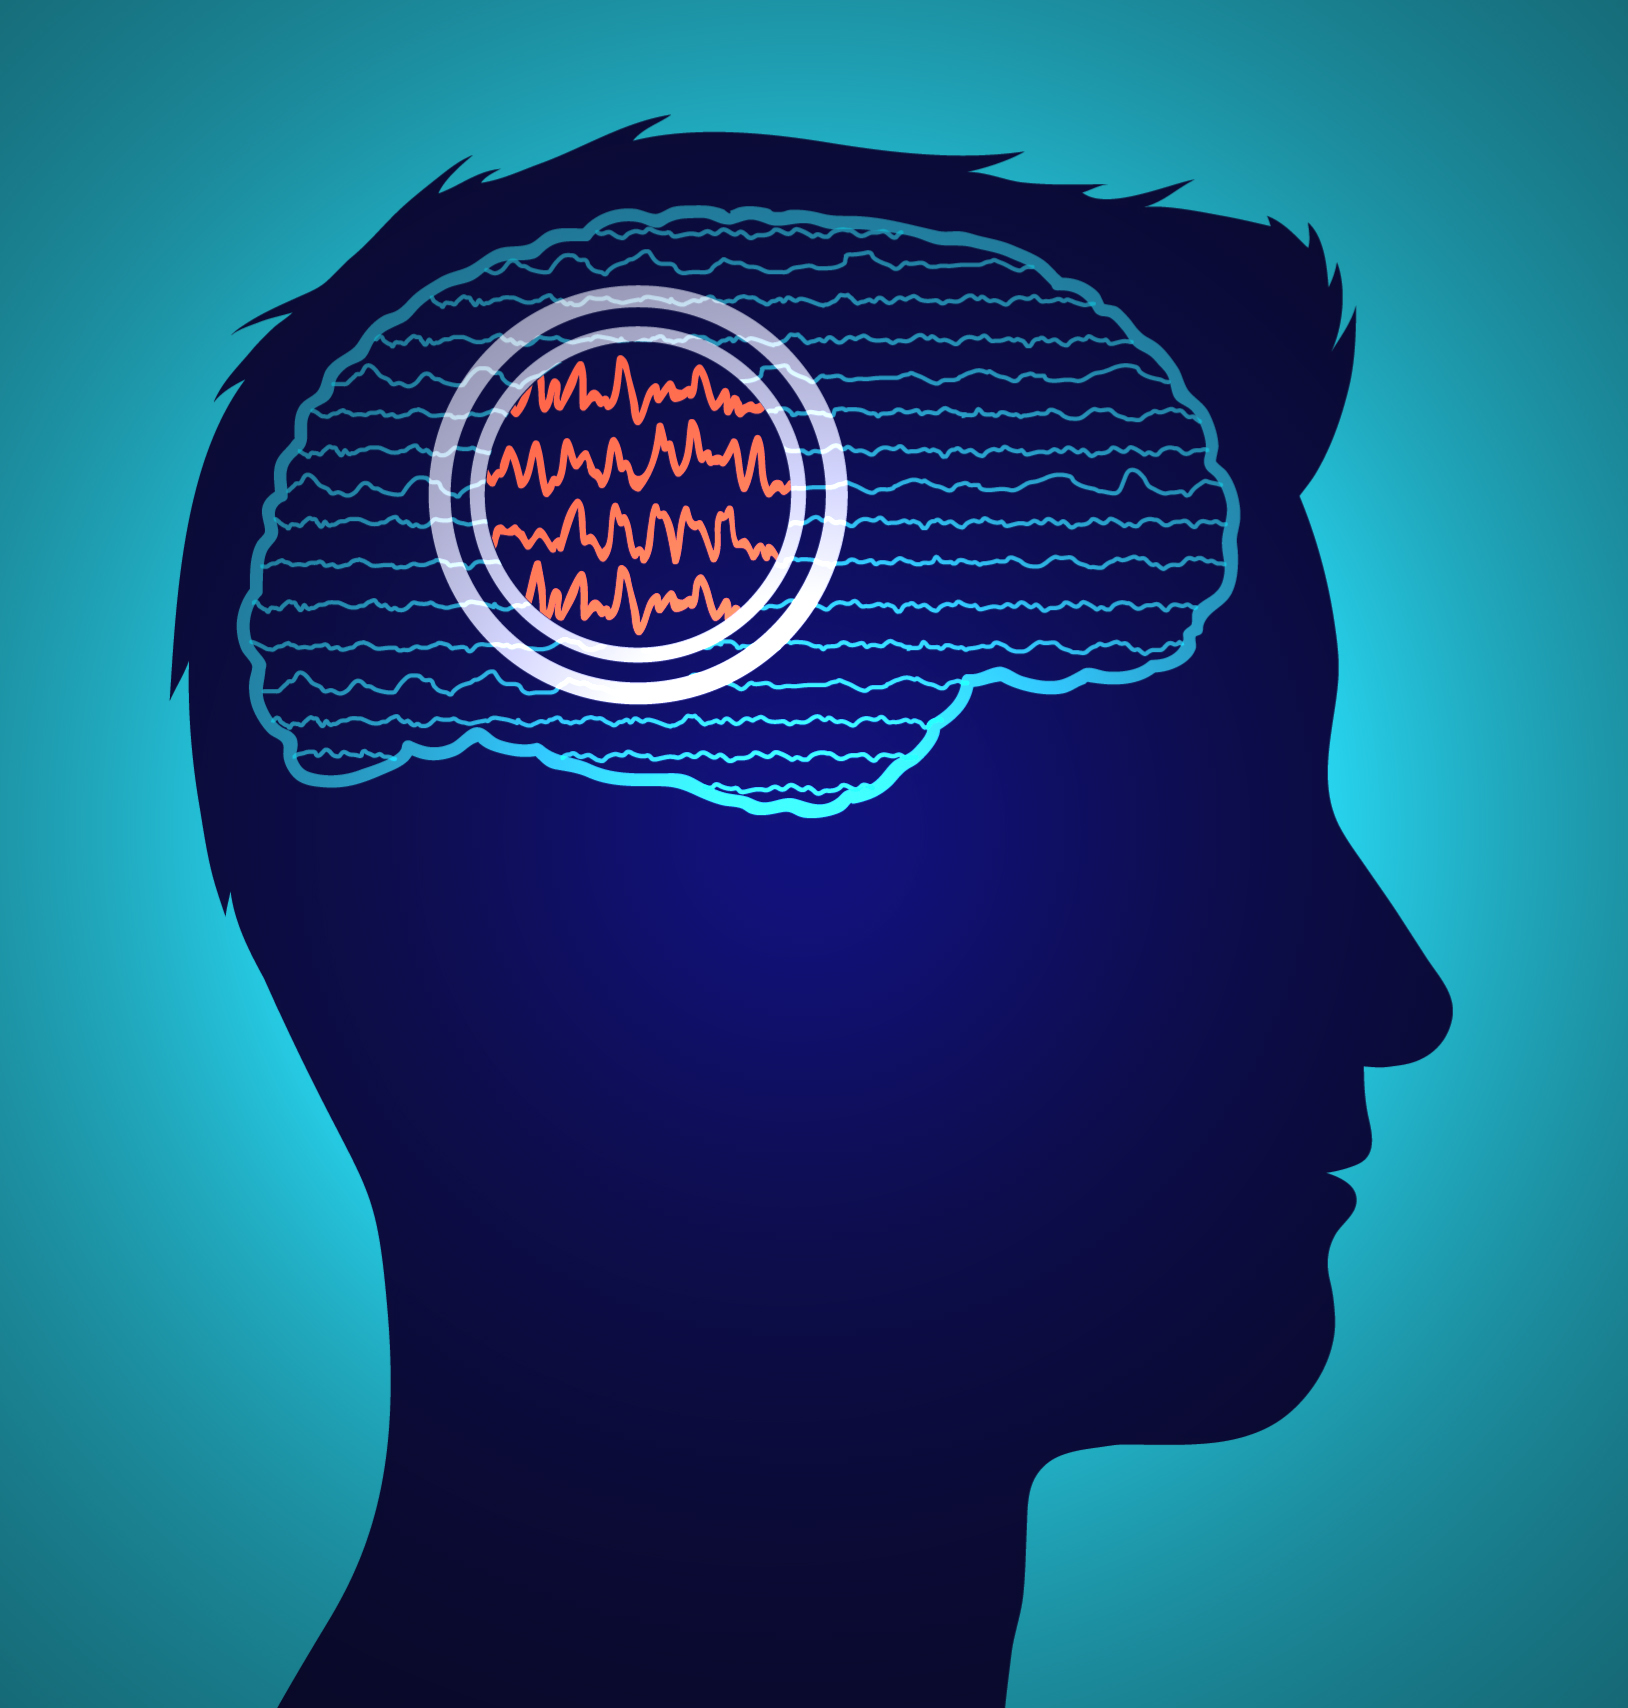 AI and Probabilistic Modeling Help Identify Epilepsy ...